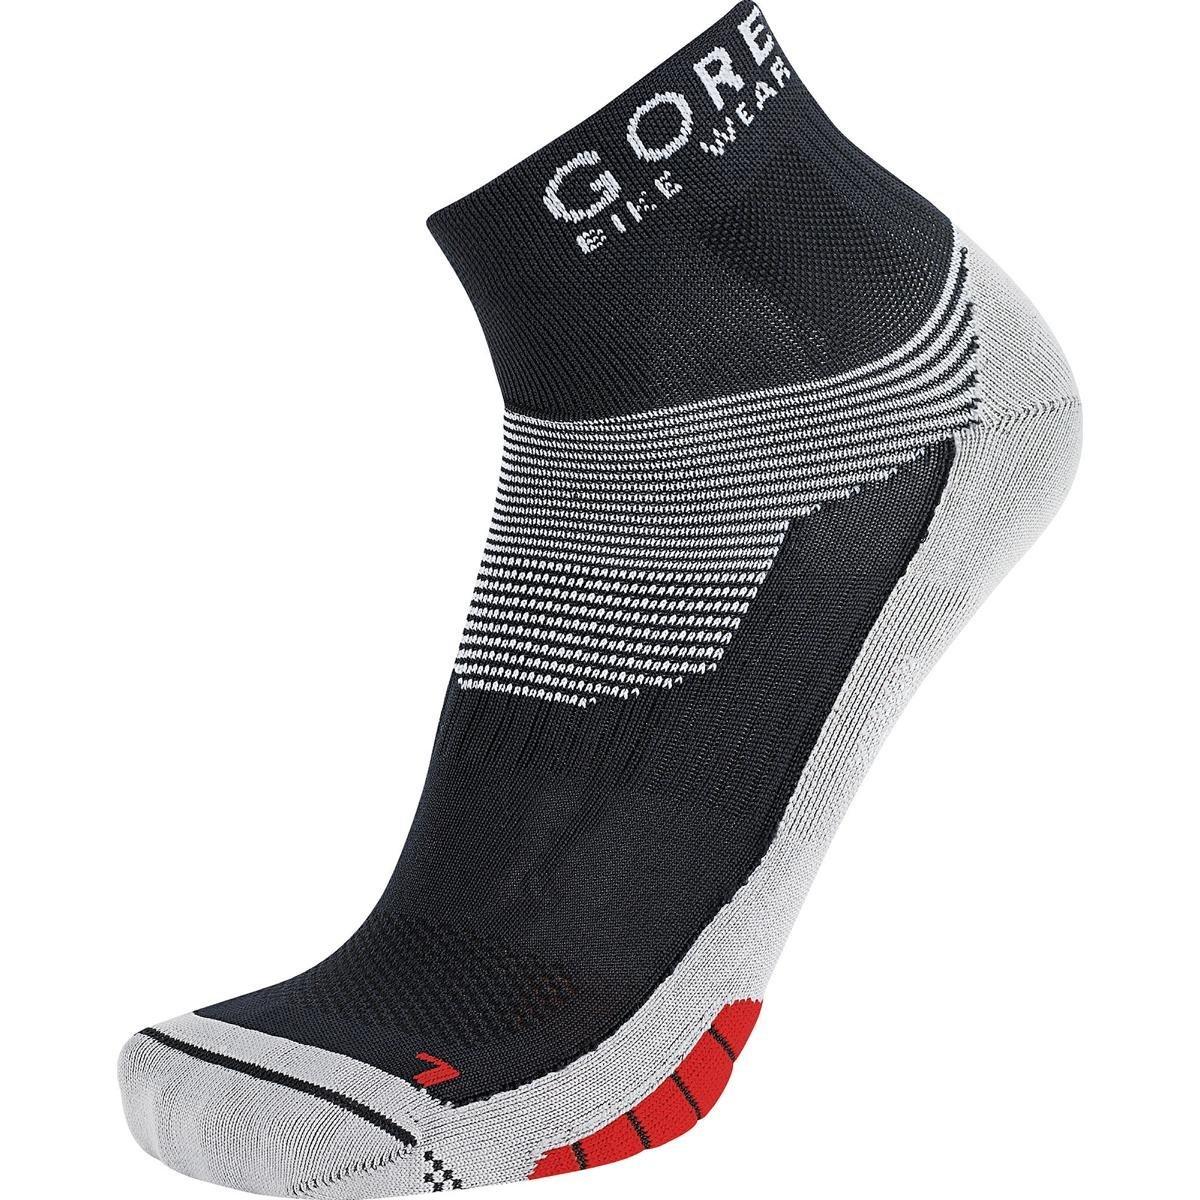 GORE BIKE WEAR Socken Xenon Calcetines de Ciclismo, Hombre